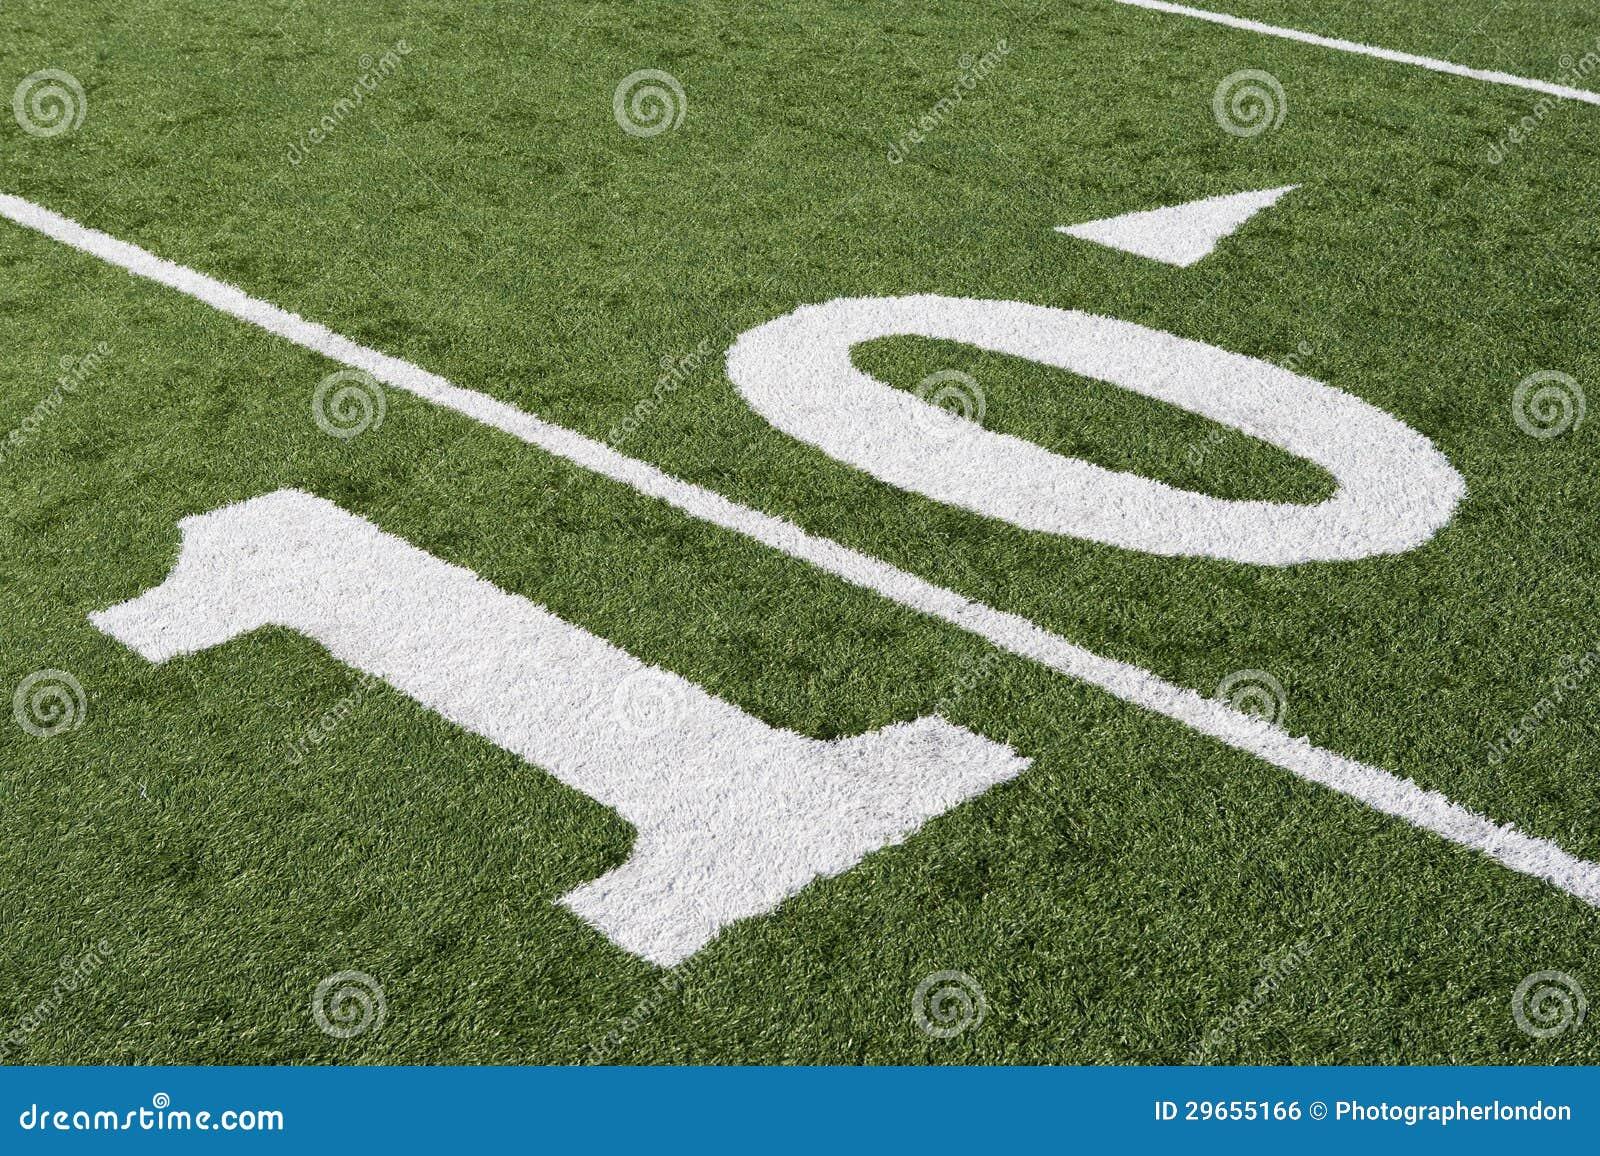 10 Yard Line On American Football Field Stock Photo Image Of Sport Yardline 29655166